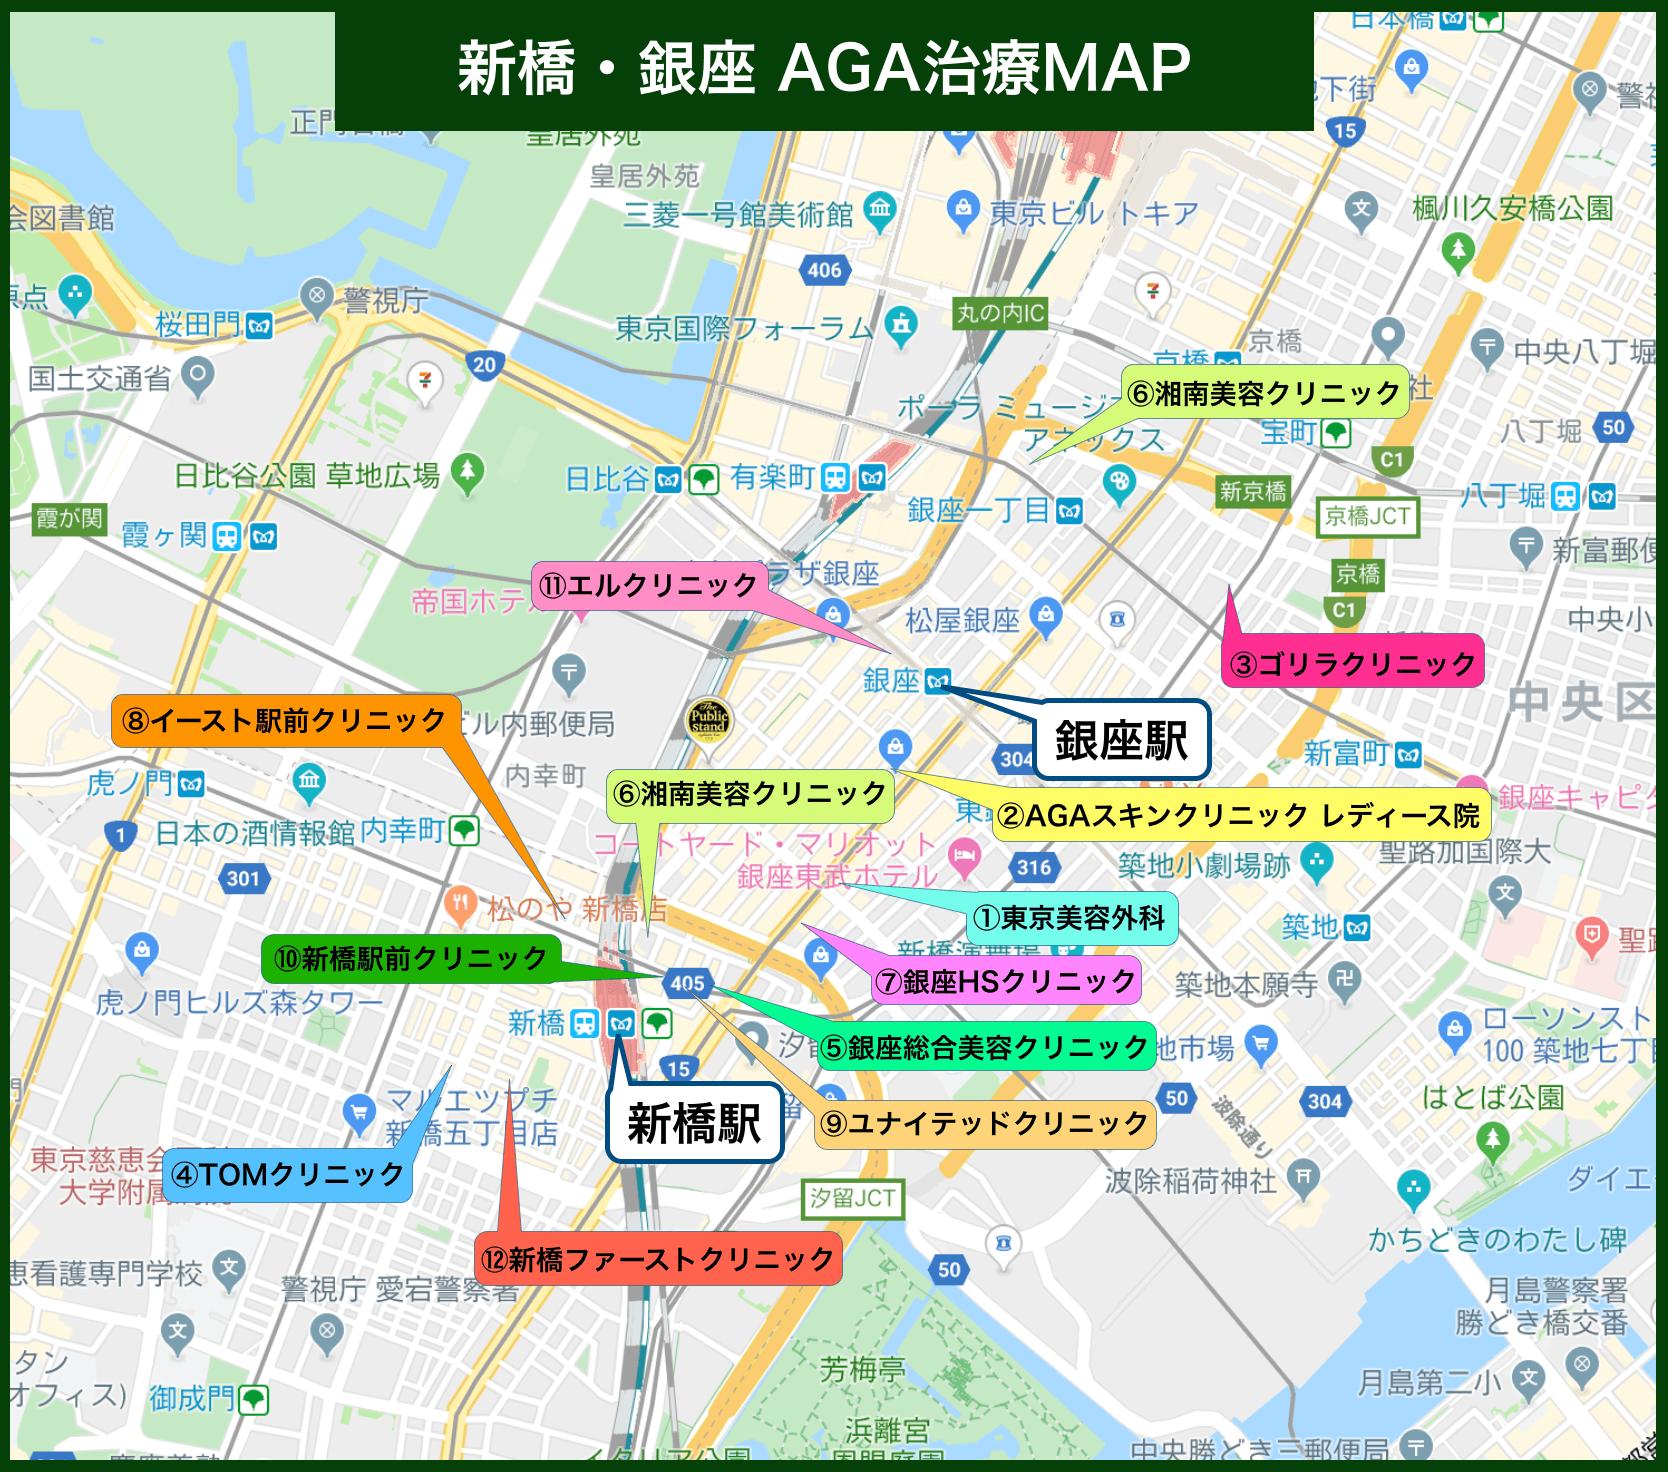 新橋・銀座AGA治療MAP(2020年版)